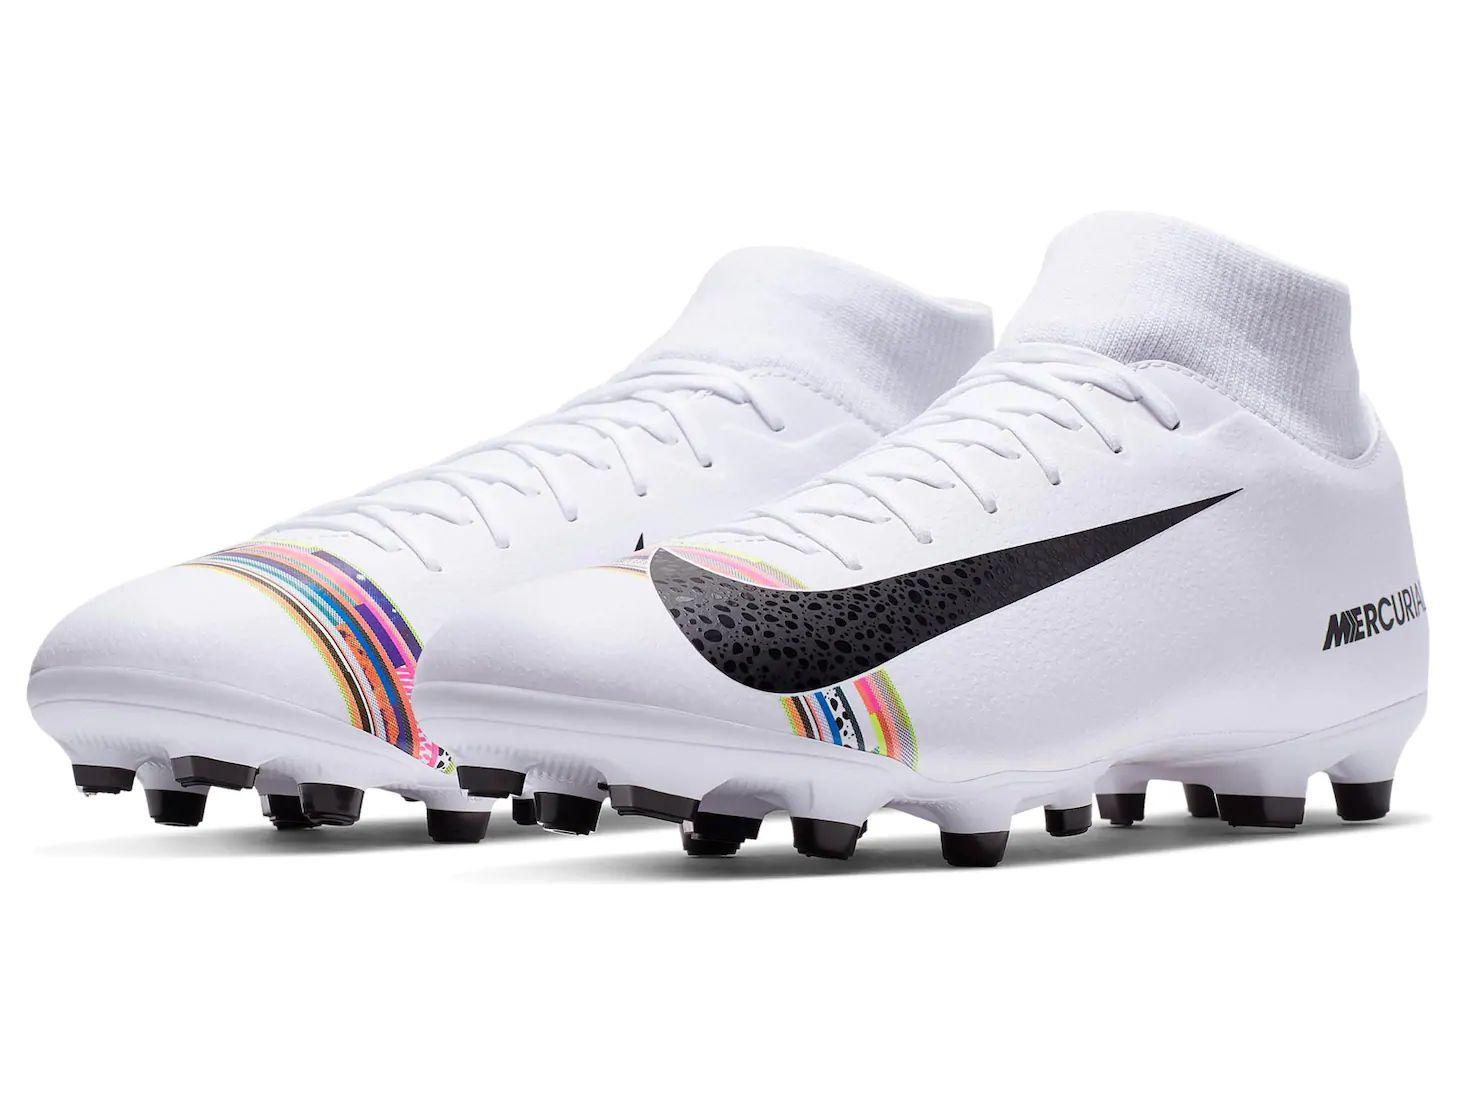 Liverpool online: calzado superfly para soccer